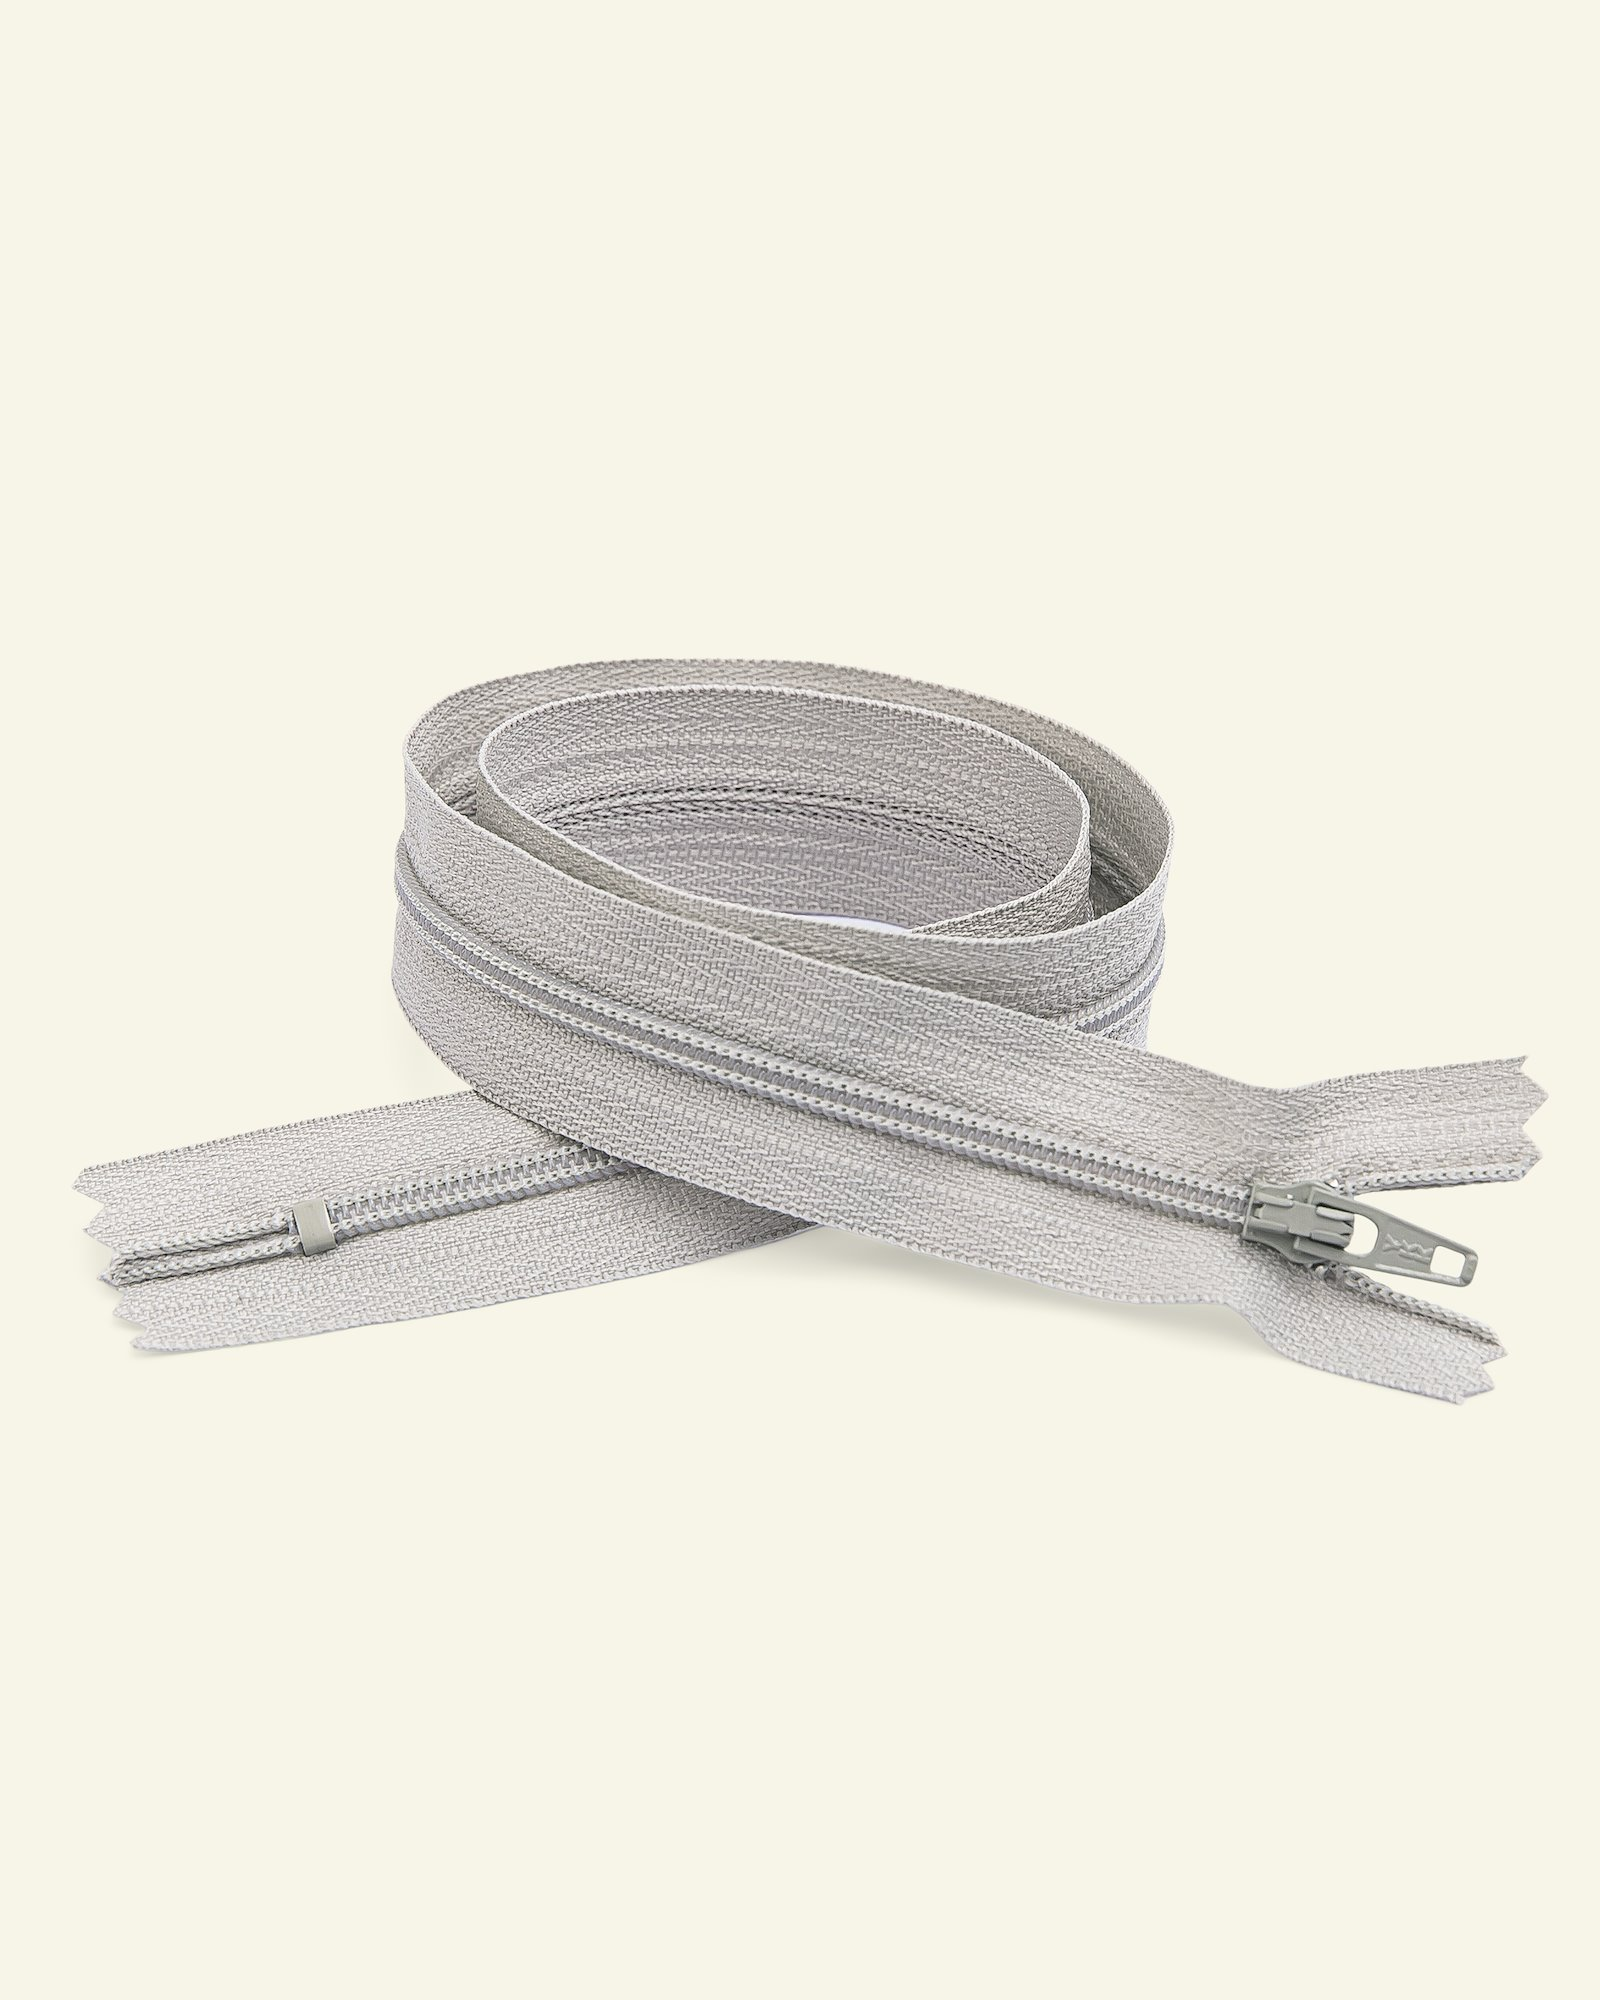 YKK zip 4mm coil closed end light grey